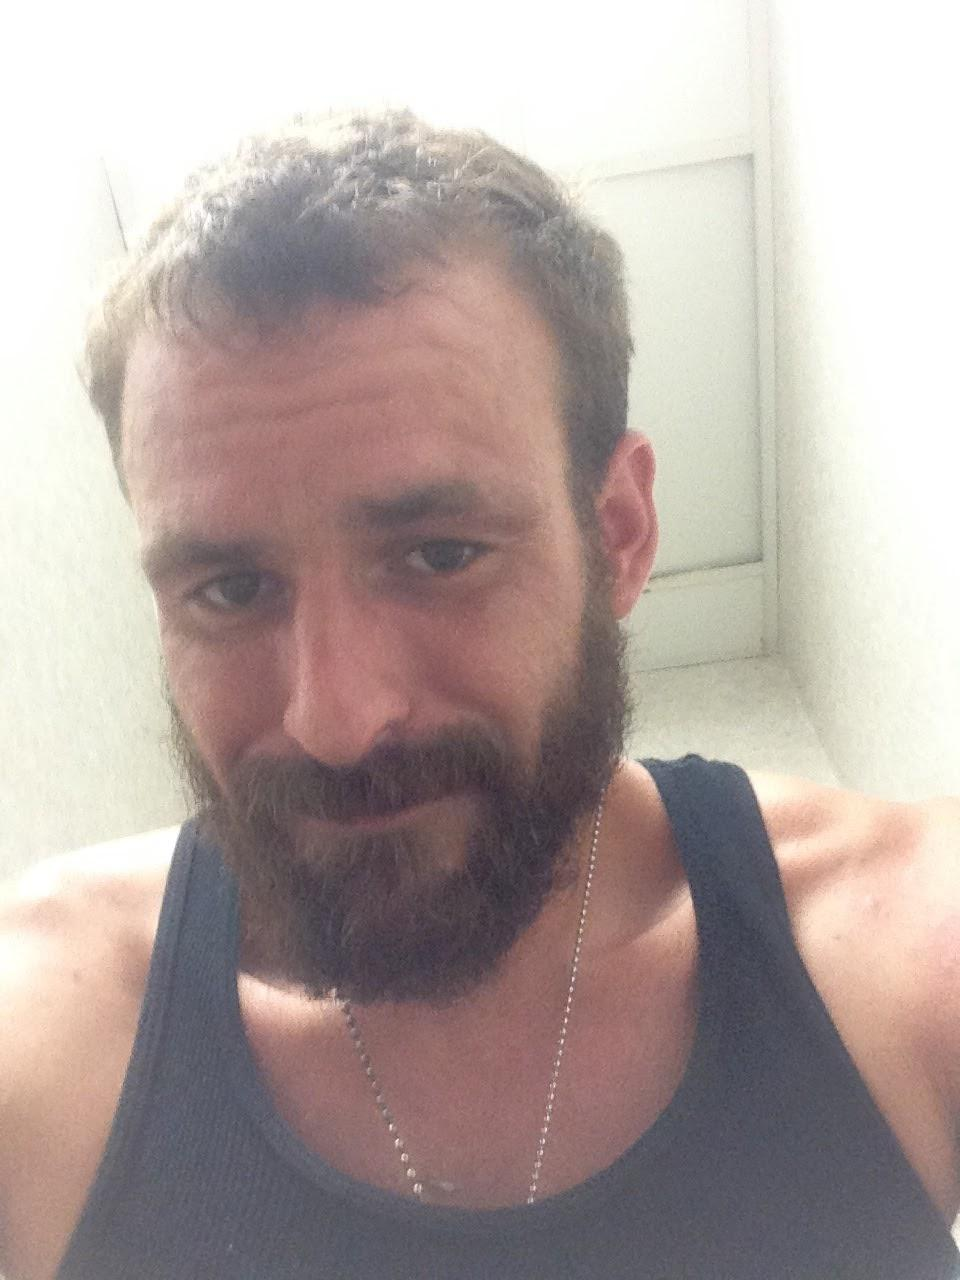 James Crossnoe, age 33